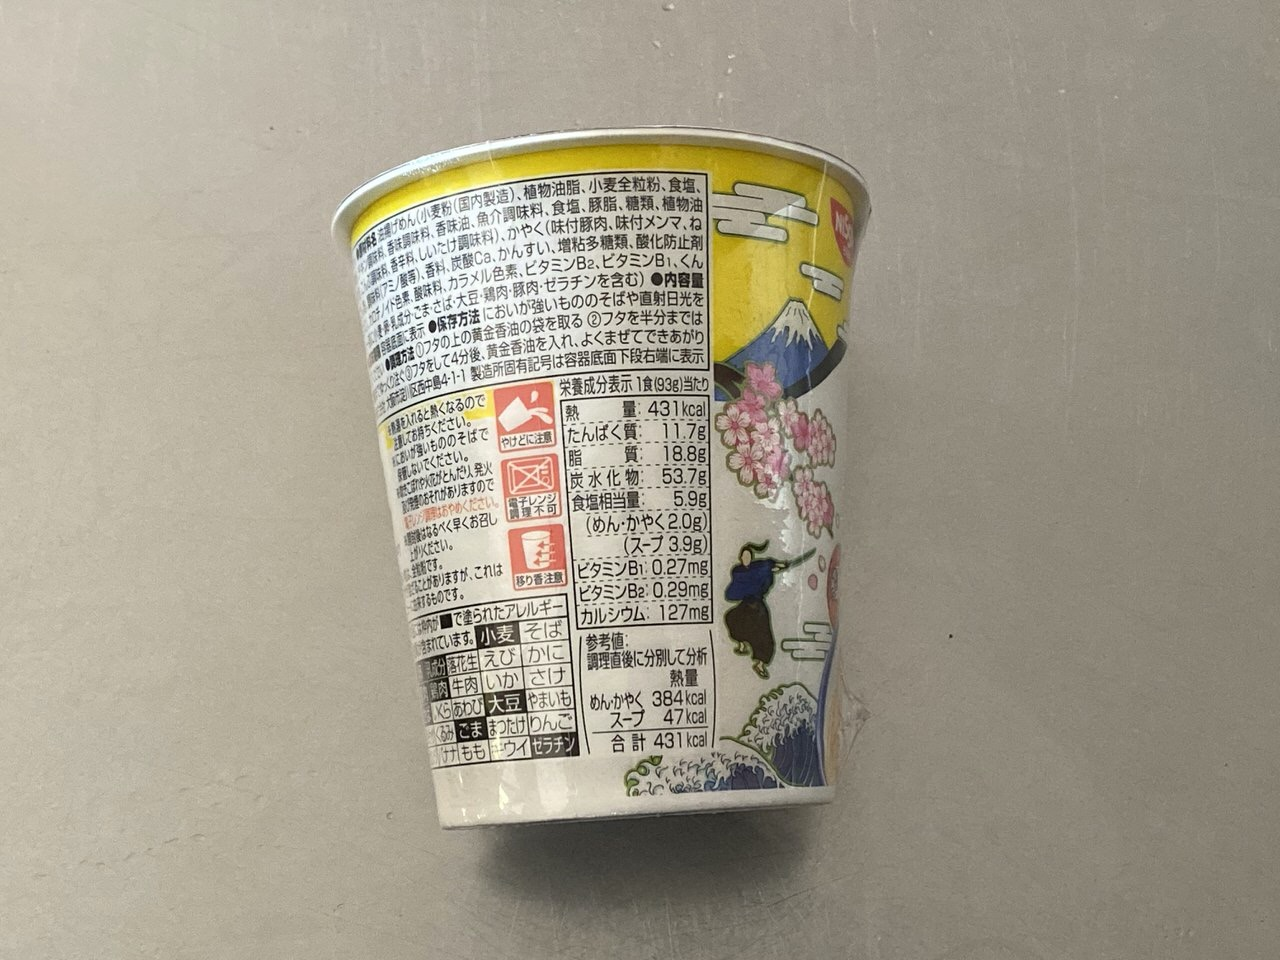 「AFURI 春限定 柚子塩らーめん 淡麗(2020)」8